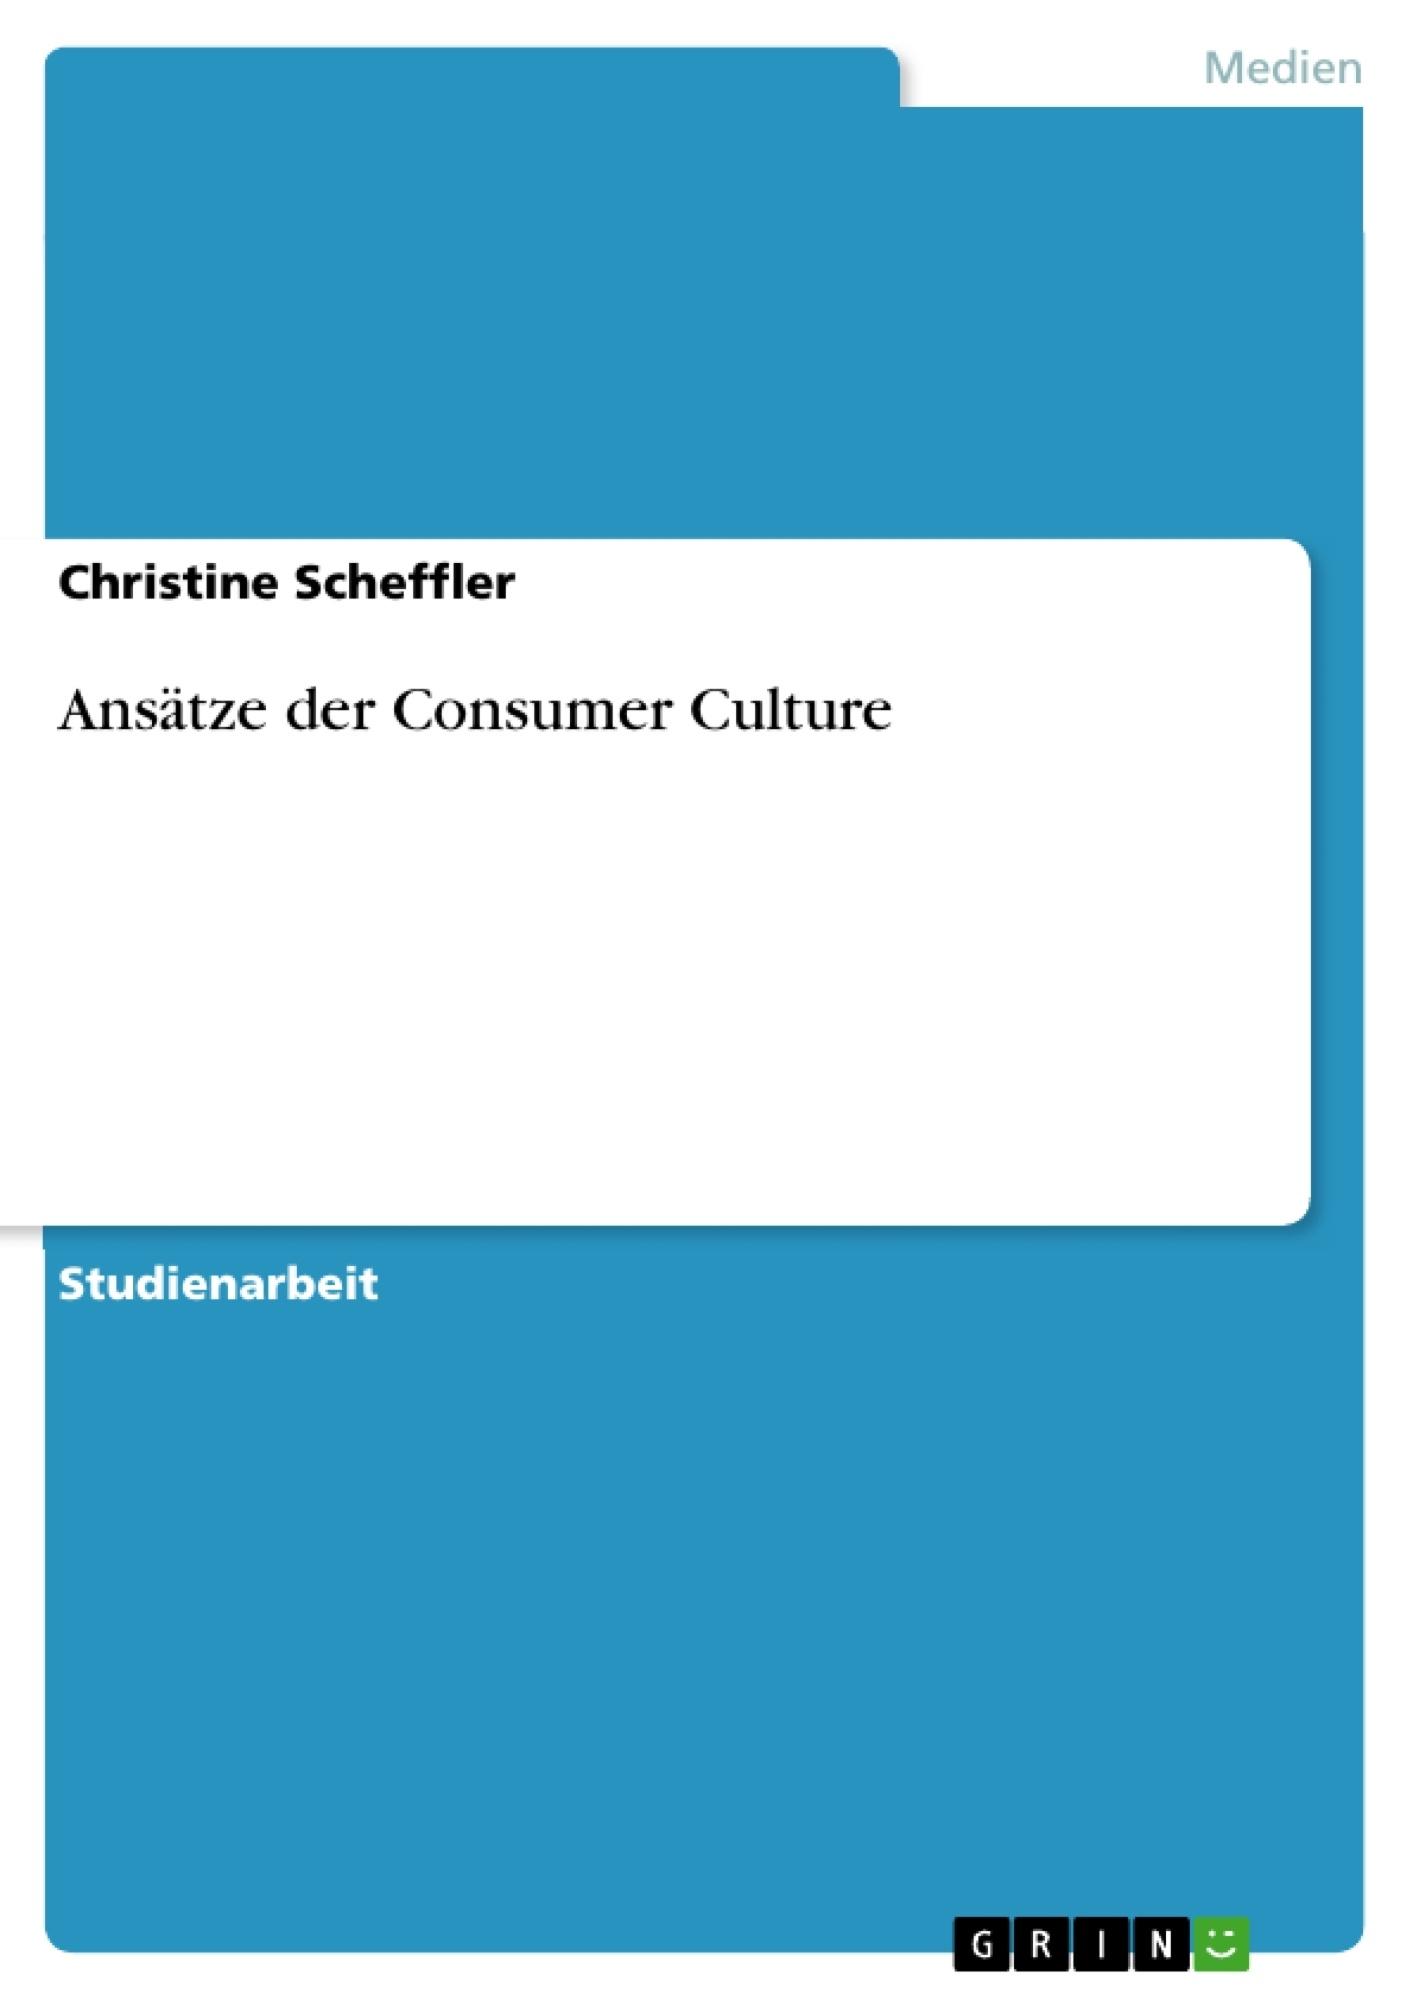 Titel: Ansätze der Consumer Culture